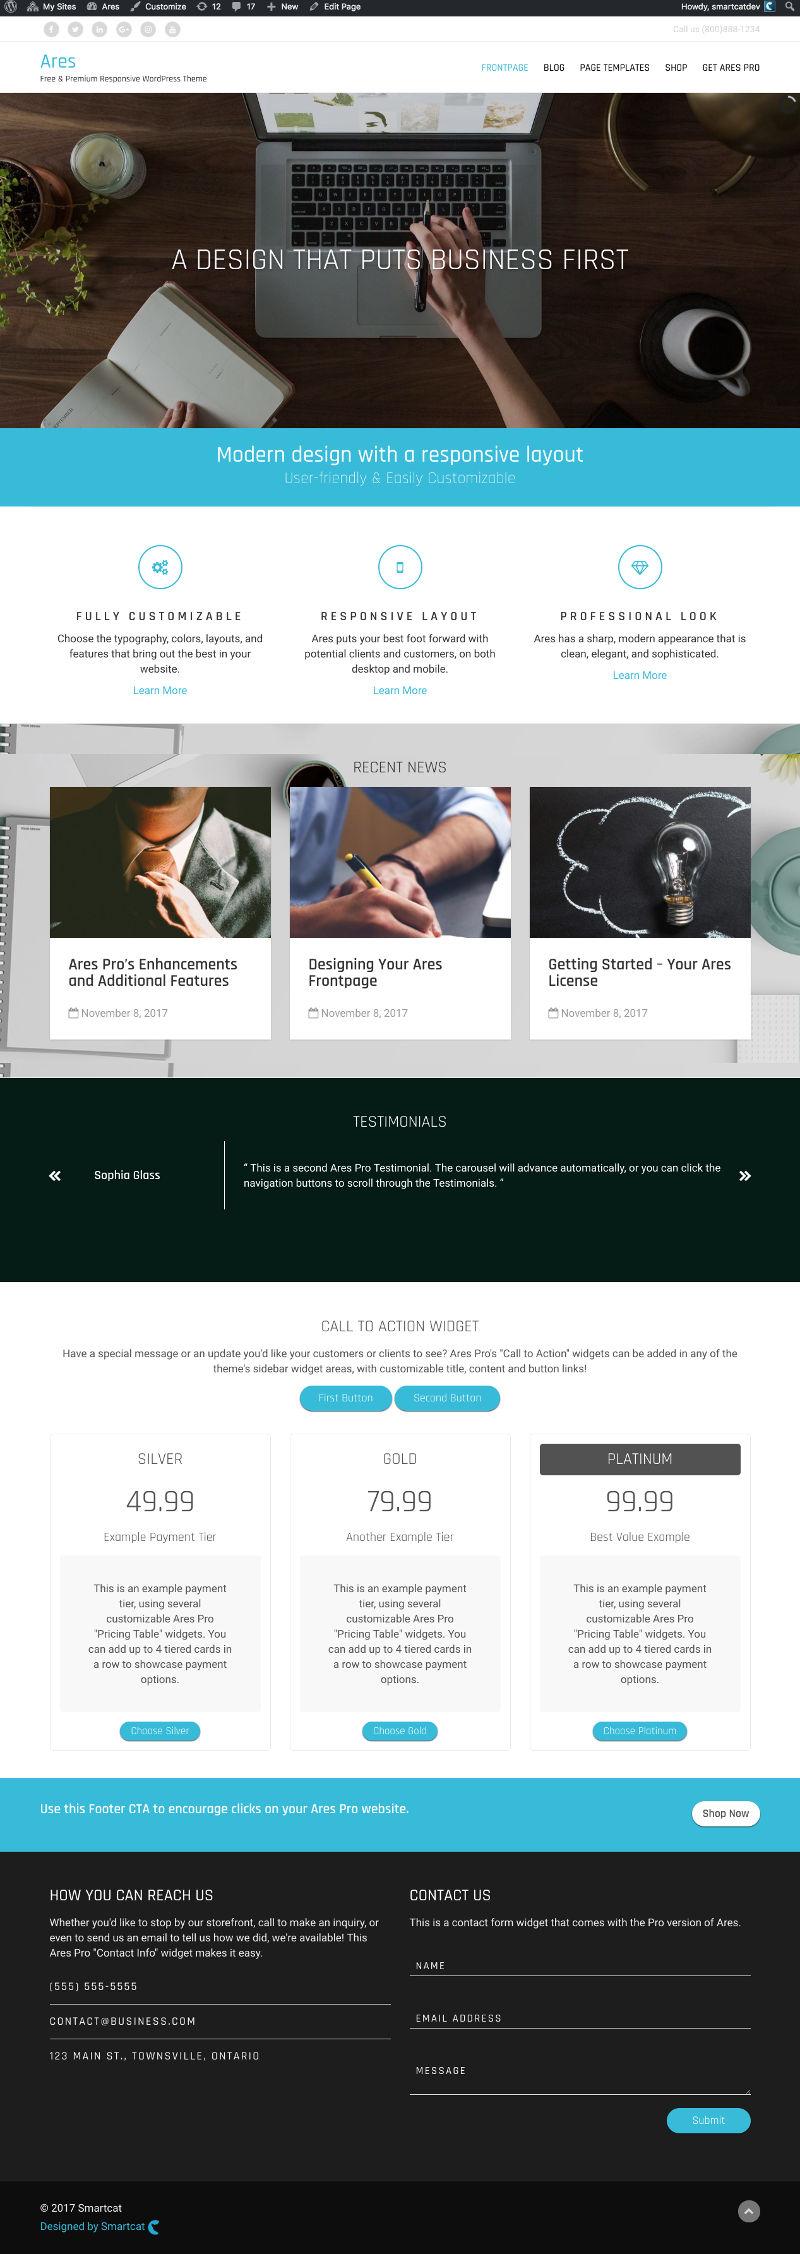 Ares Pro - V2 - Smartcat - Premium WordPress Themes & Plugins